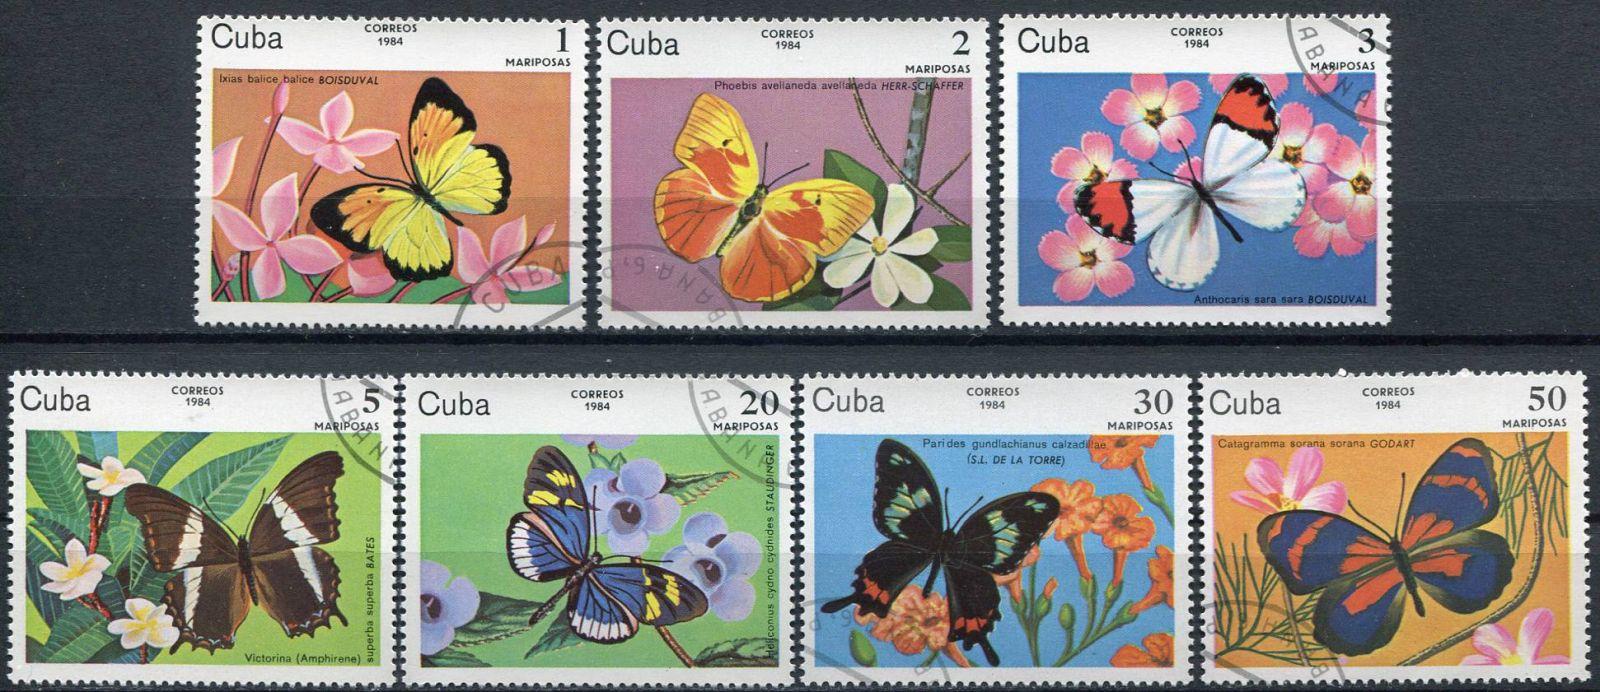 (1984) MiNr. 2821 - 2827 - O - Kuba - Motýli   www.tgw.cz